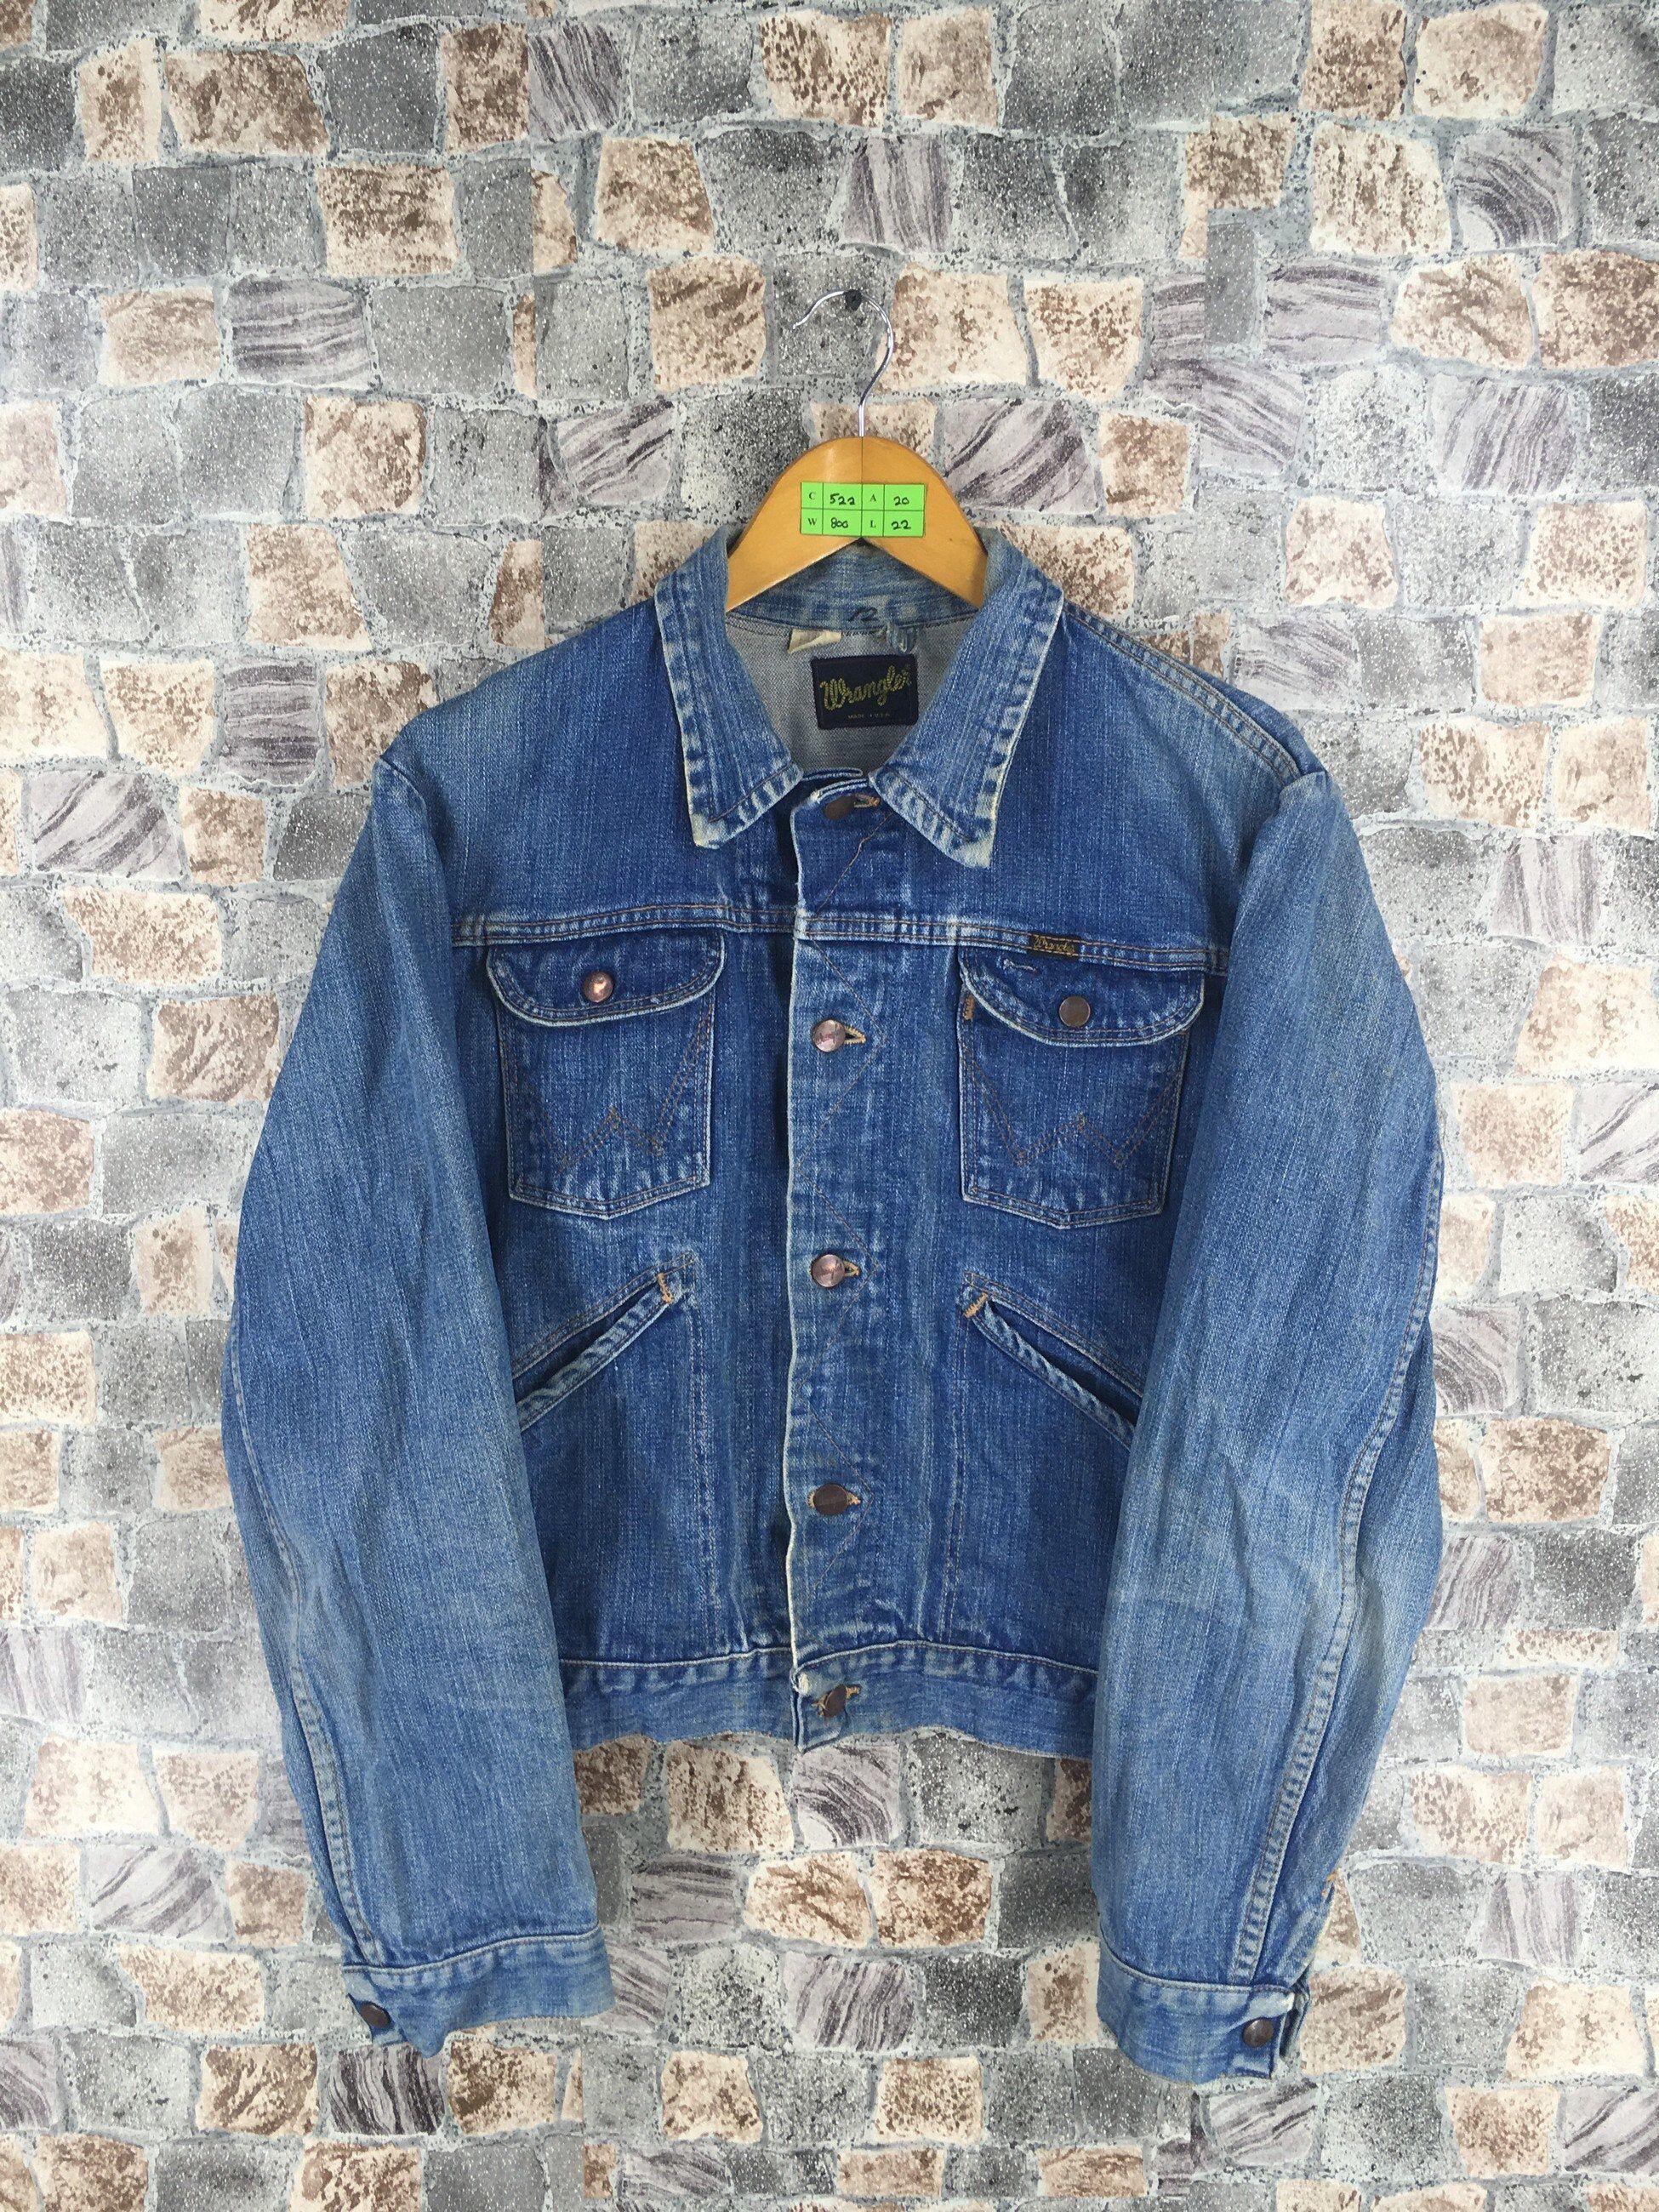 Vintage 80s Wrangler Denim Jeans Jacket Medium Wrangler Etsy Vintage Levis Denim Jacket Denim Jean Jacket Denim Jacket Outfit [ 2600 x 1950 Pixel ]